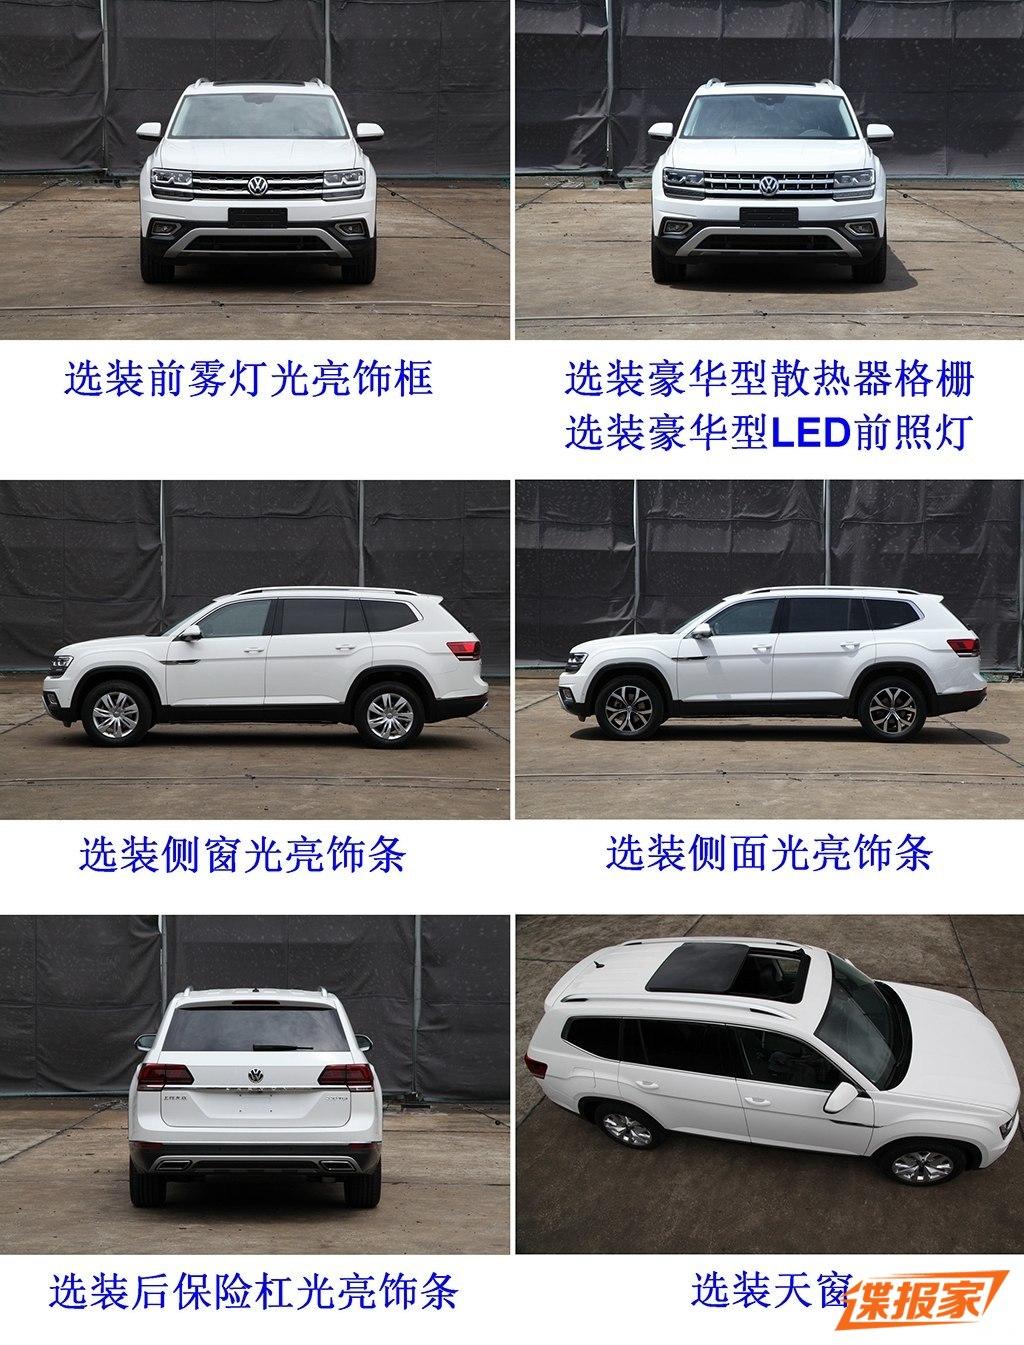 2017 - [Volkswagen] Atlas / Teramont - Page 5 AHR0cDovL3FuLnd3dzIuYXV0b2ltZy5jbi93YXRlcm1hcmsucG5n